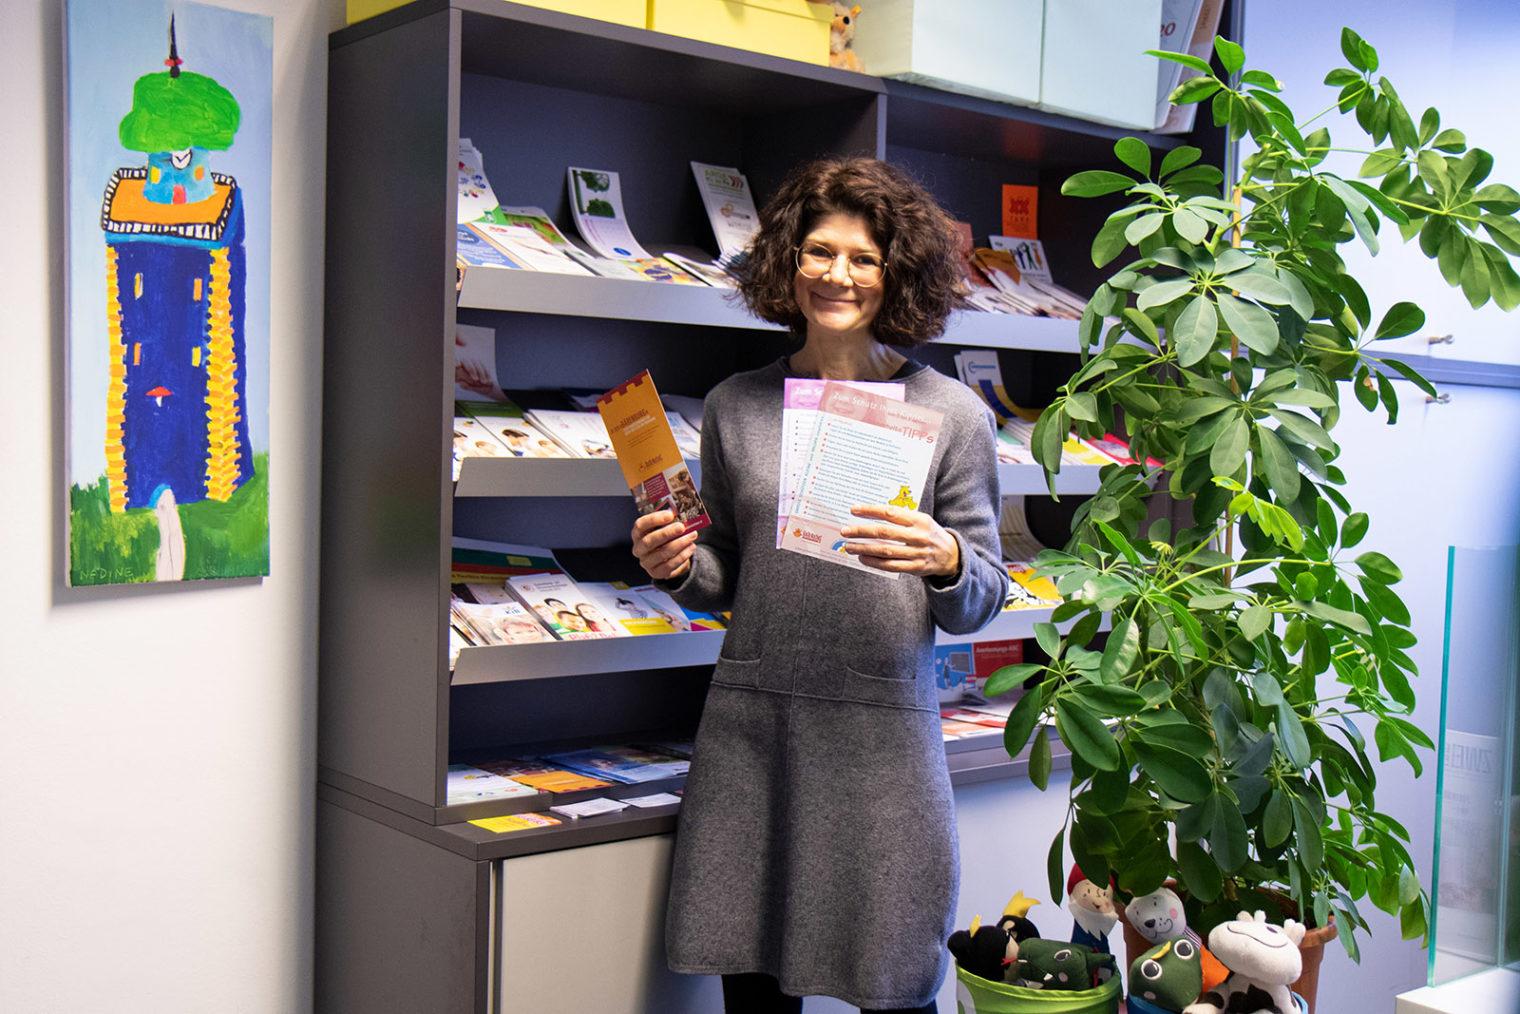 Claudia Leeb mit Infofoldern